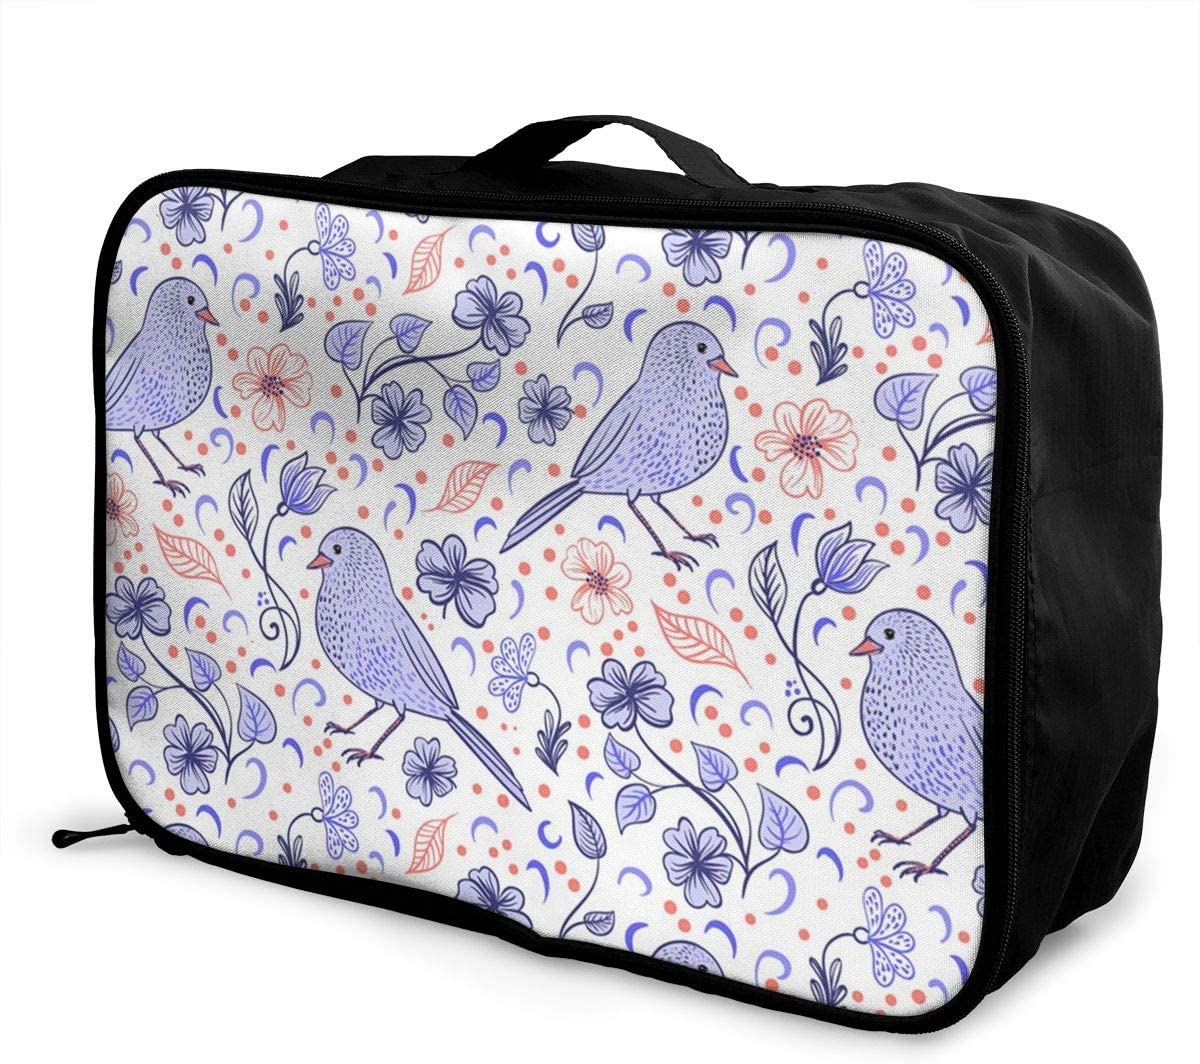 Cute Animal Travel Carry-on Luggage Weekender Bag Overnight Tote Flight Duffel In Trolley Handle